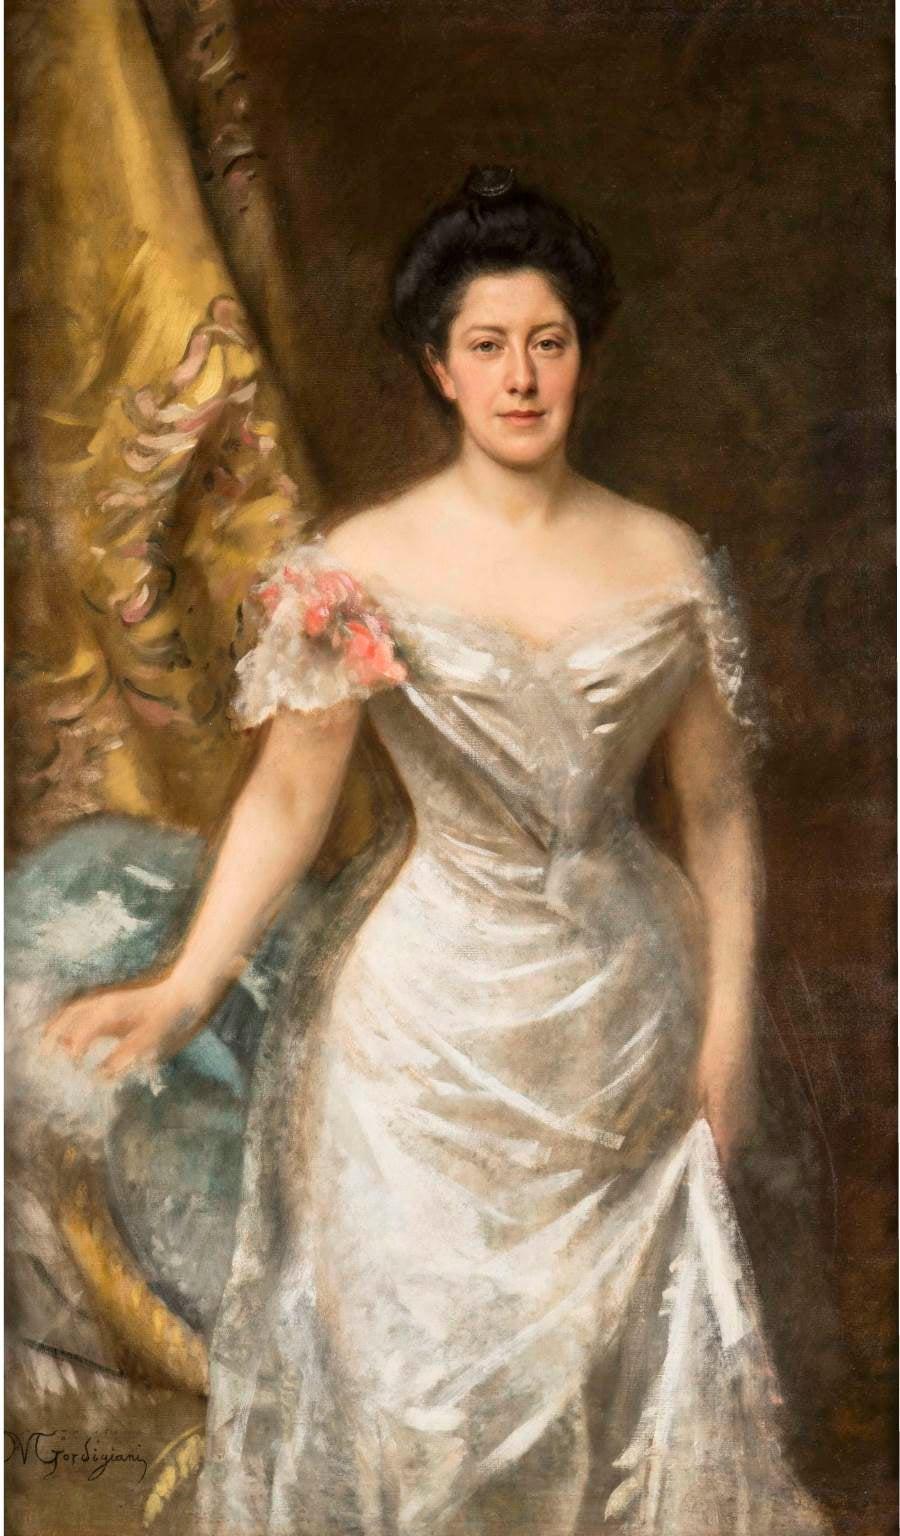 Michele Gordigiani, Portrait of a lady, 1880 circa, oil on canvas, signed